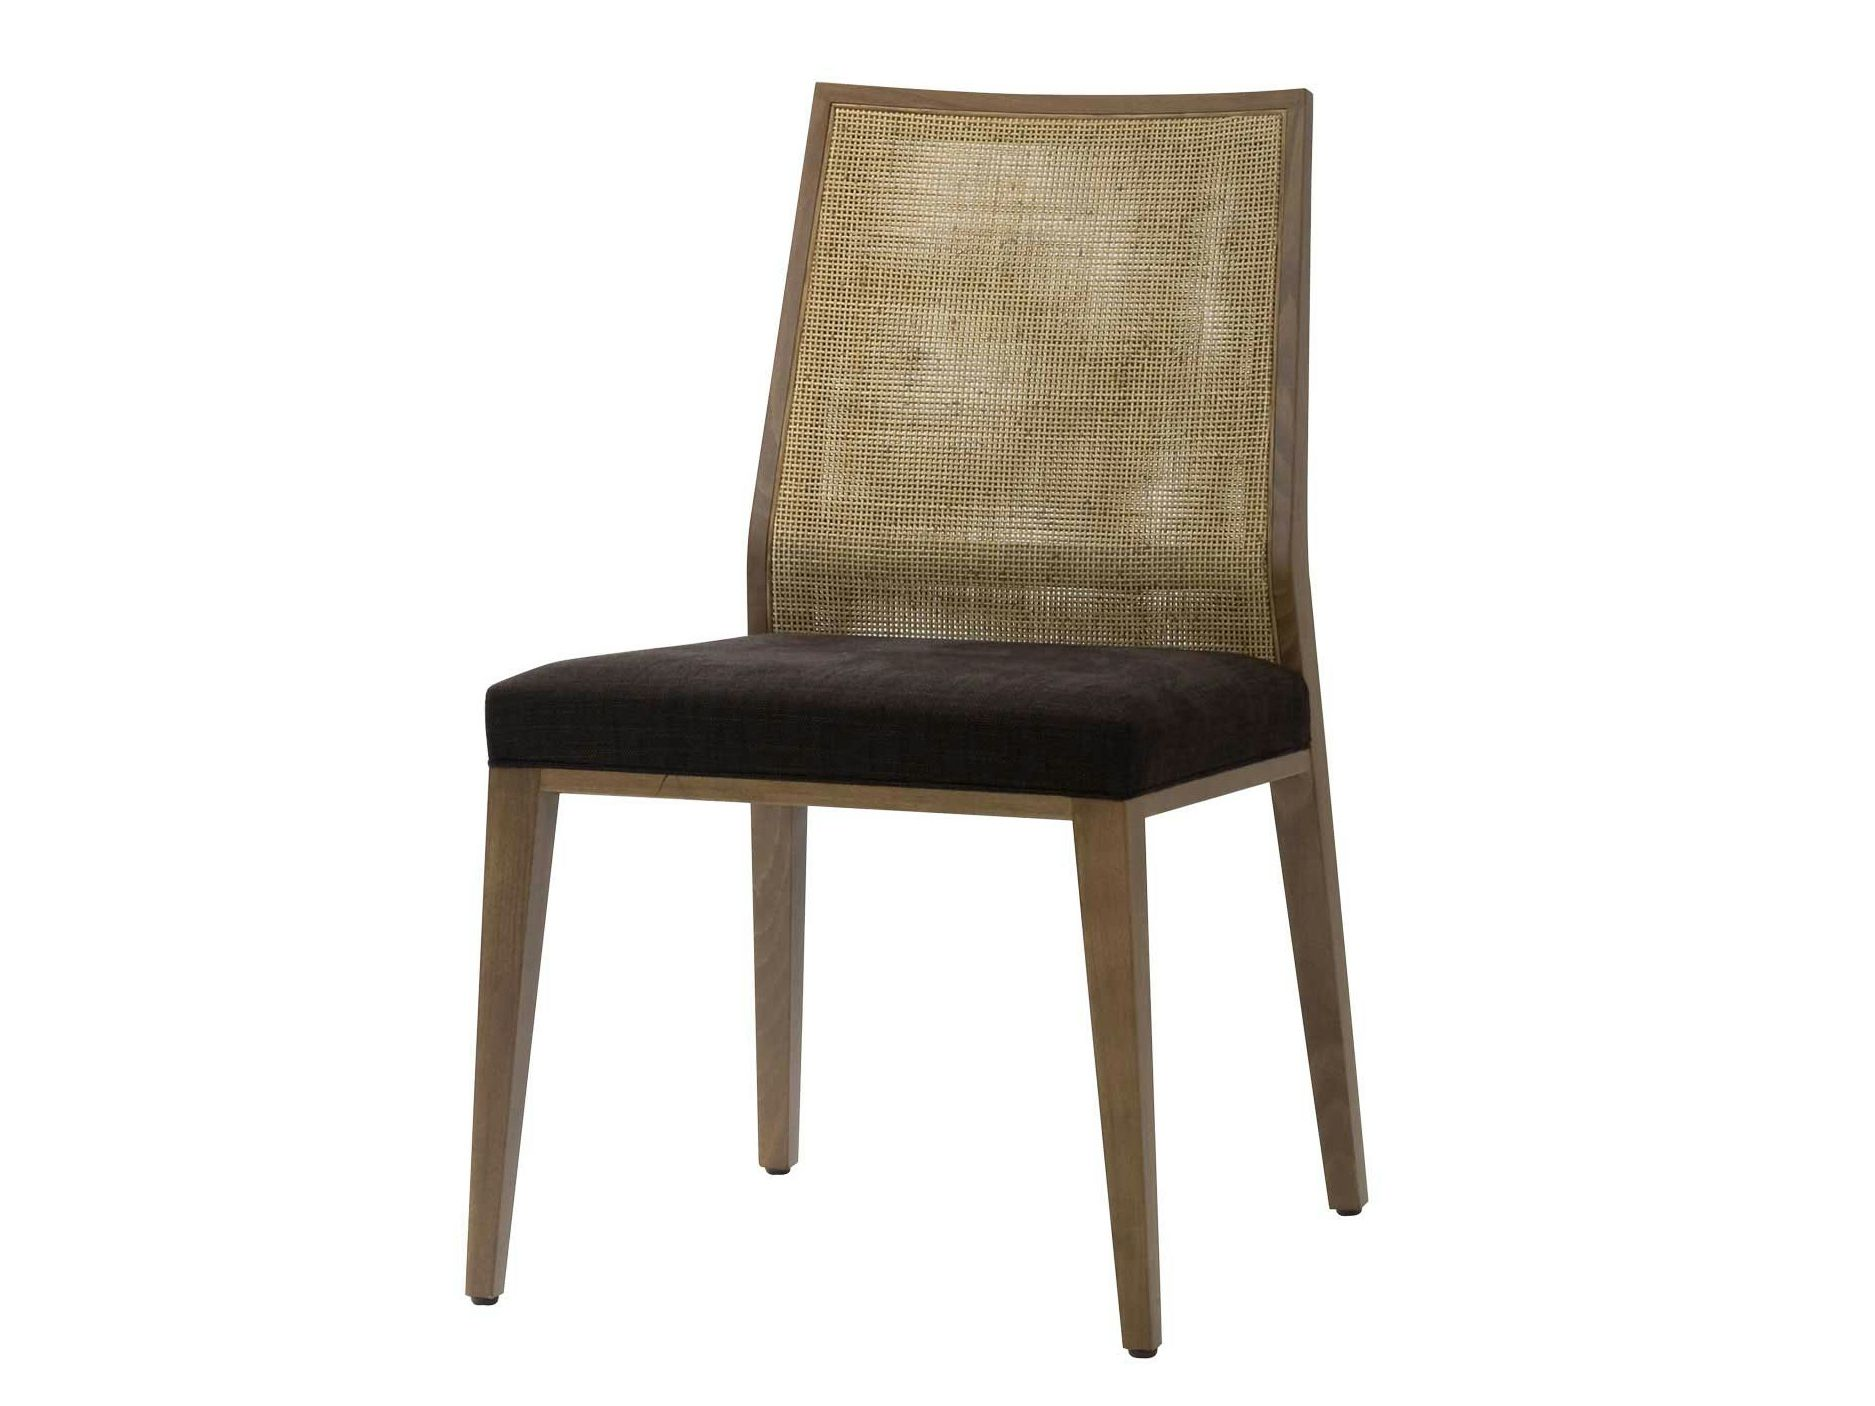 Bobois mobili ~ Beech chair queen les contemporains collection by roche bobois